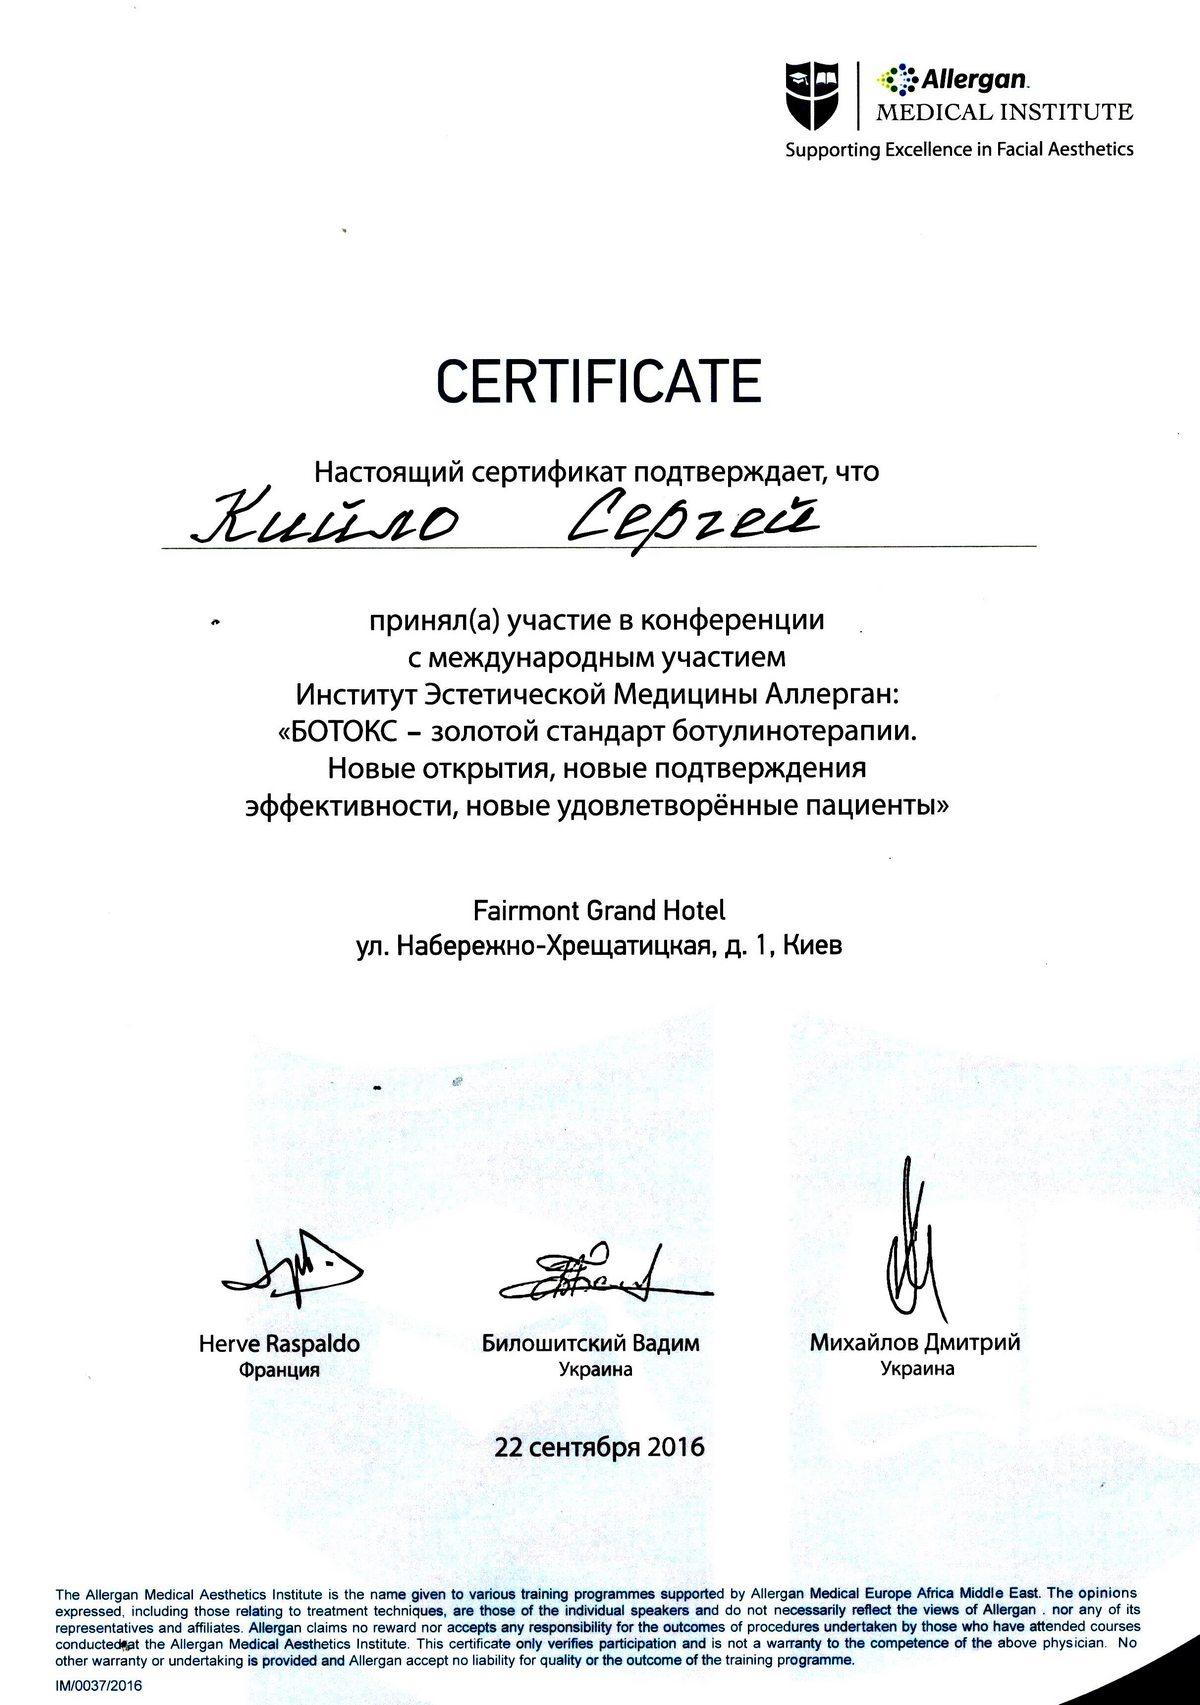 Документ №:34 Сертификат пластического хирурга Кийло Сергея Алексеевича